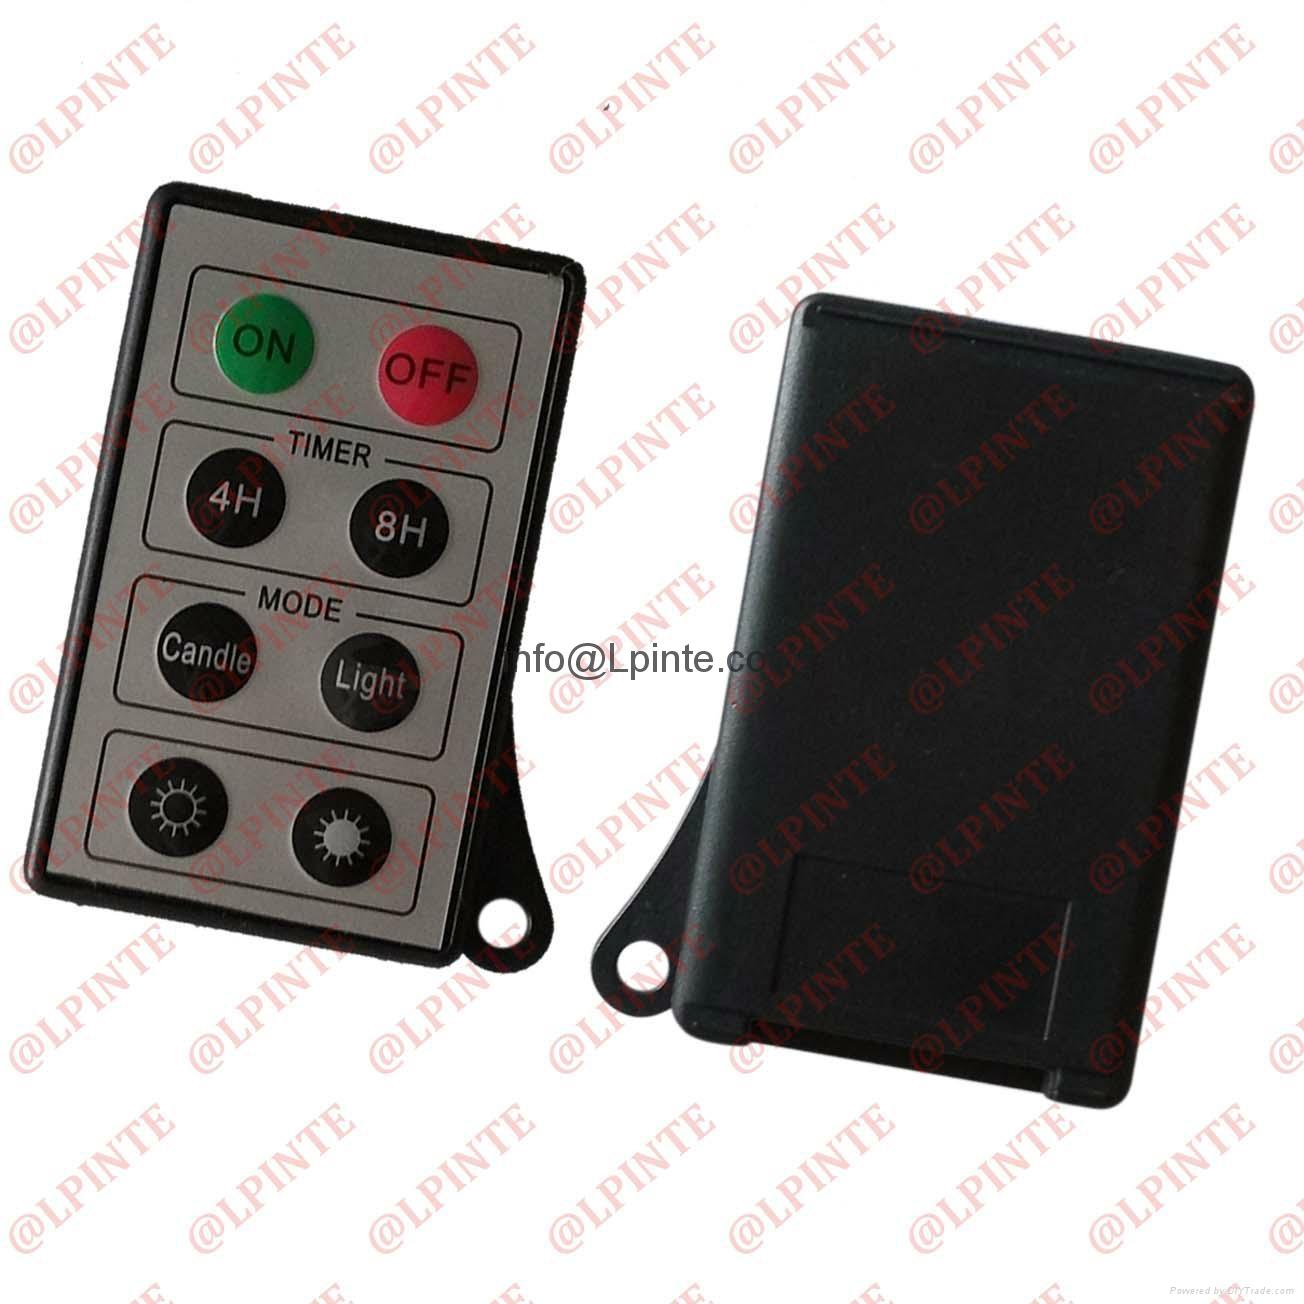 media music radio  light small remote control with hole uk LPI-M08A 2